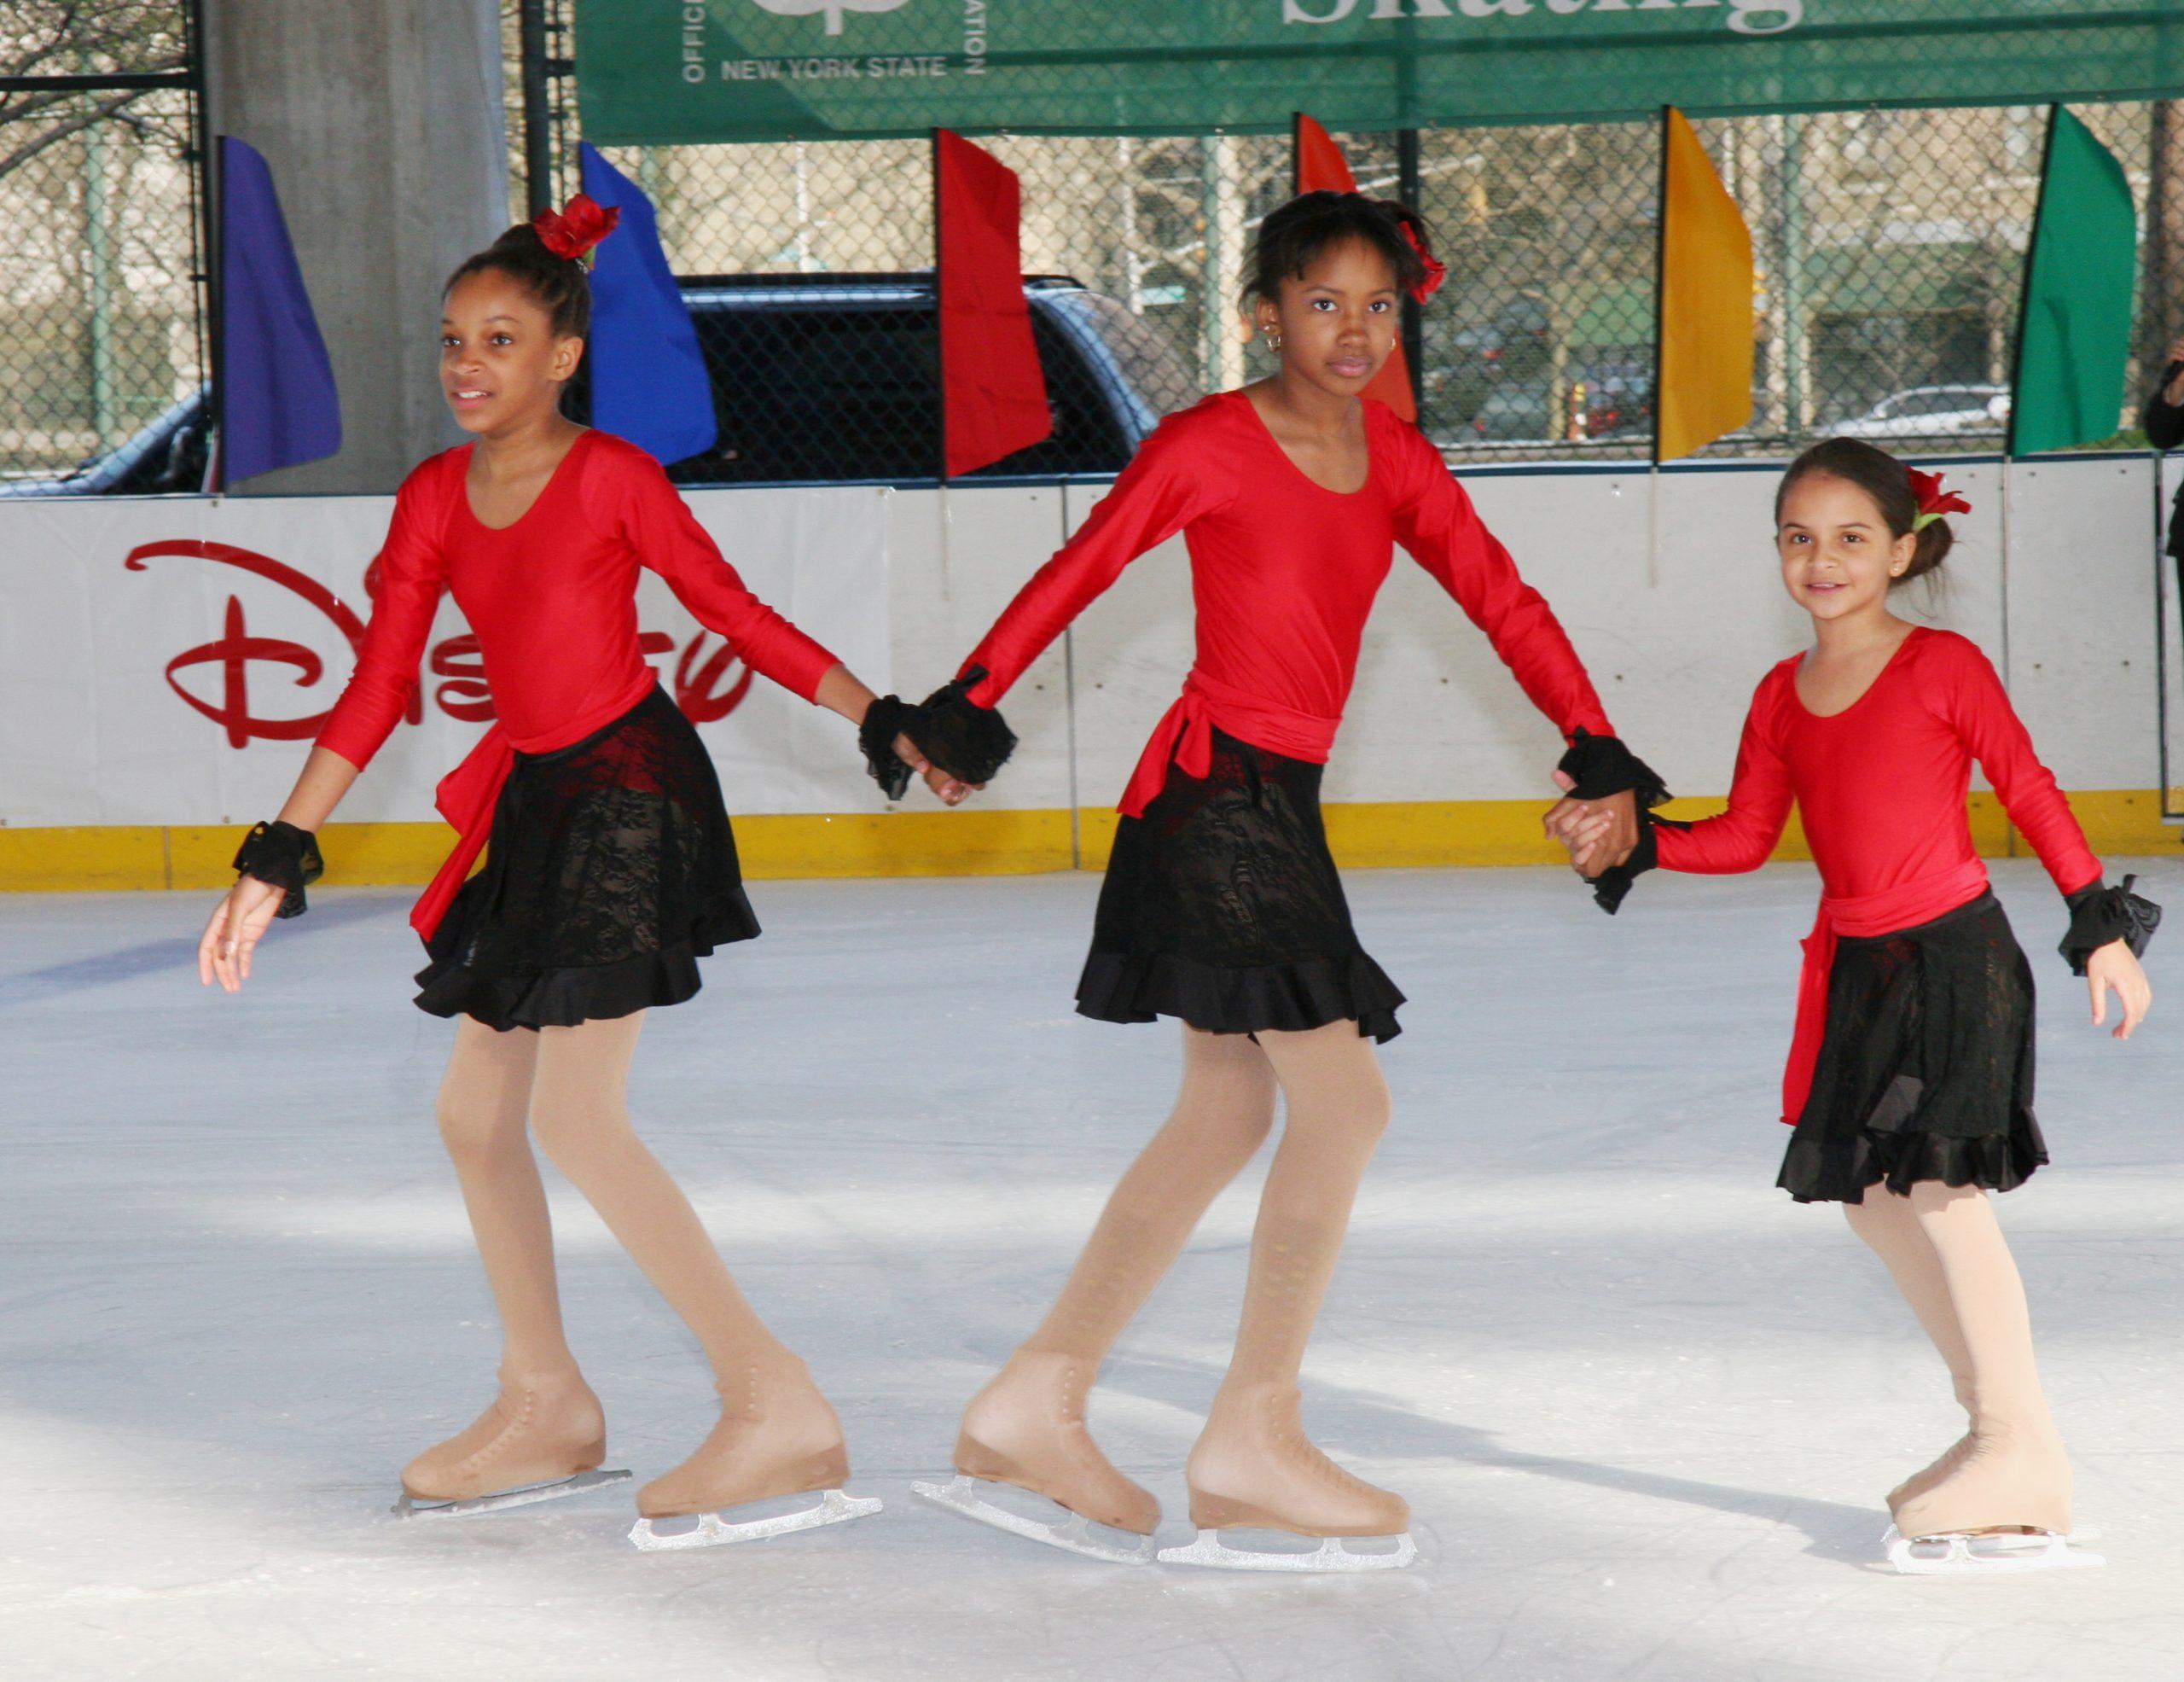 FSIH Ice SHow 2008